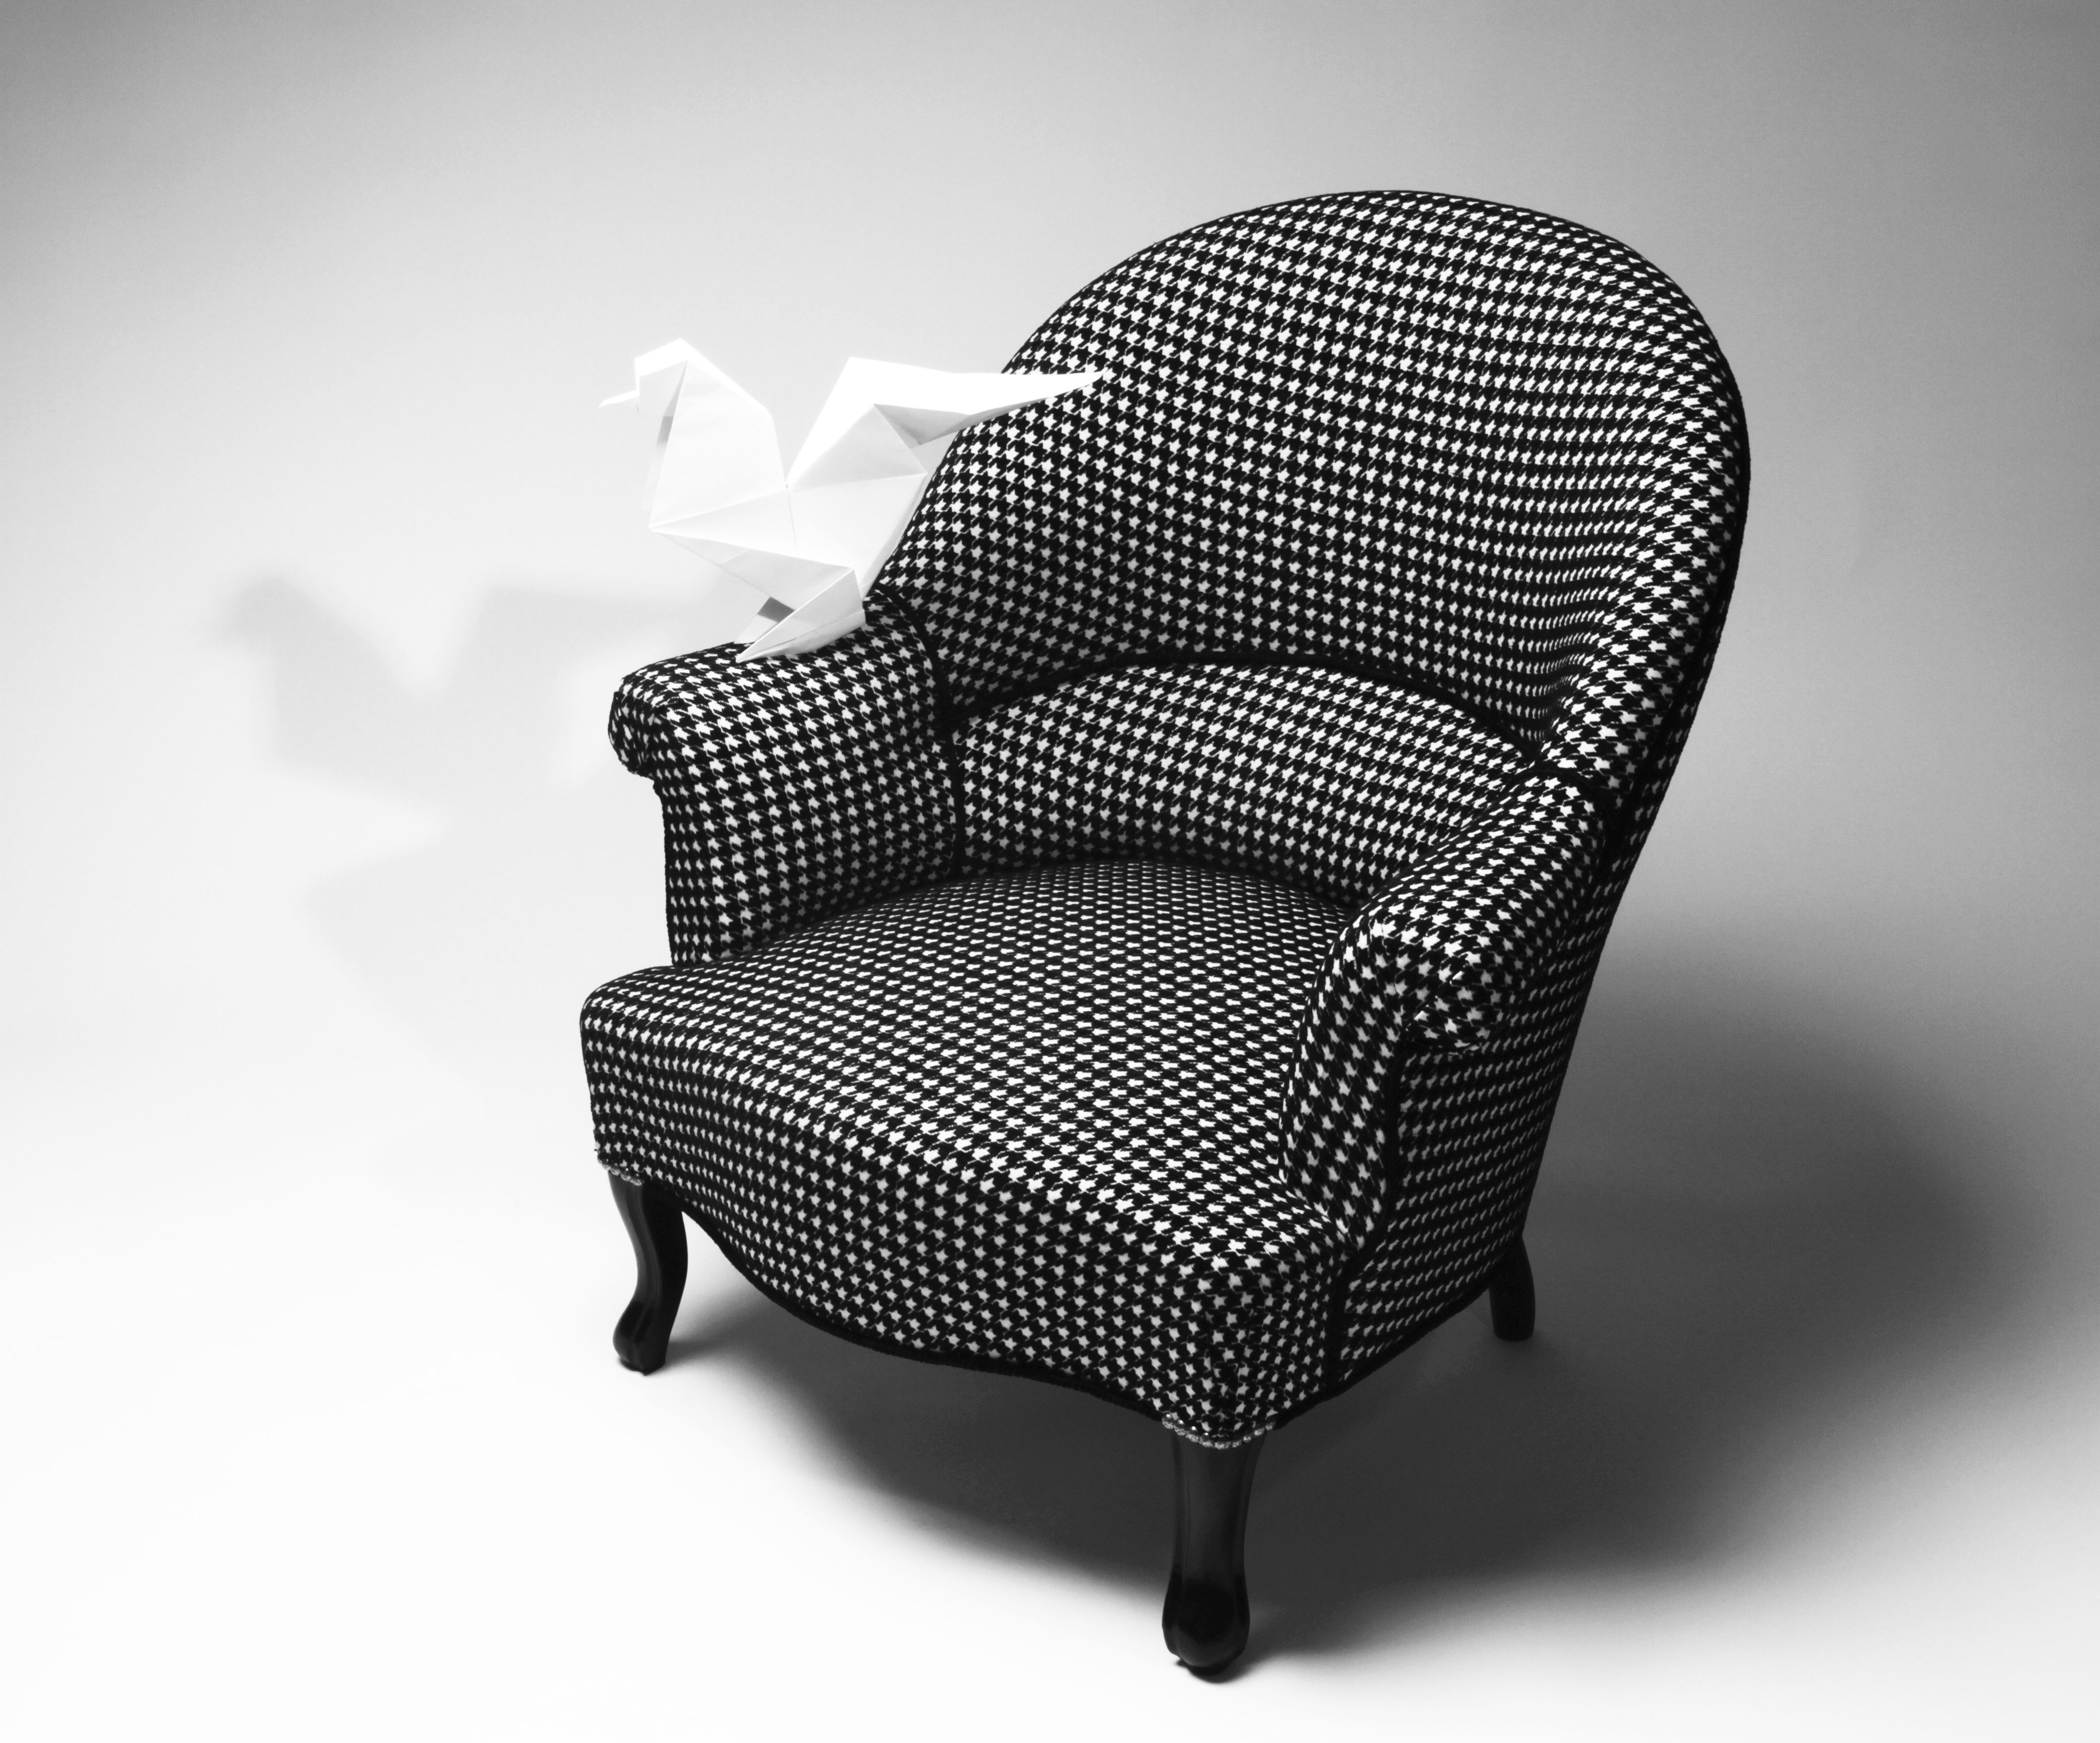 08 fauteuil crapaud 2 tapisserie pinterest. Black Bedroom Furniture Sets. Home Design Ideas